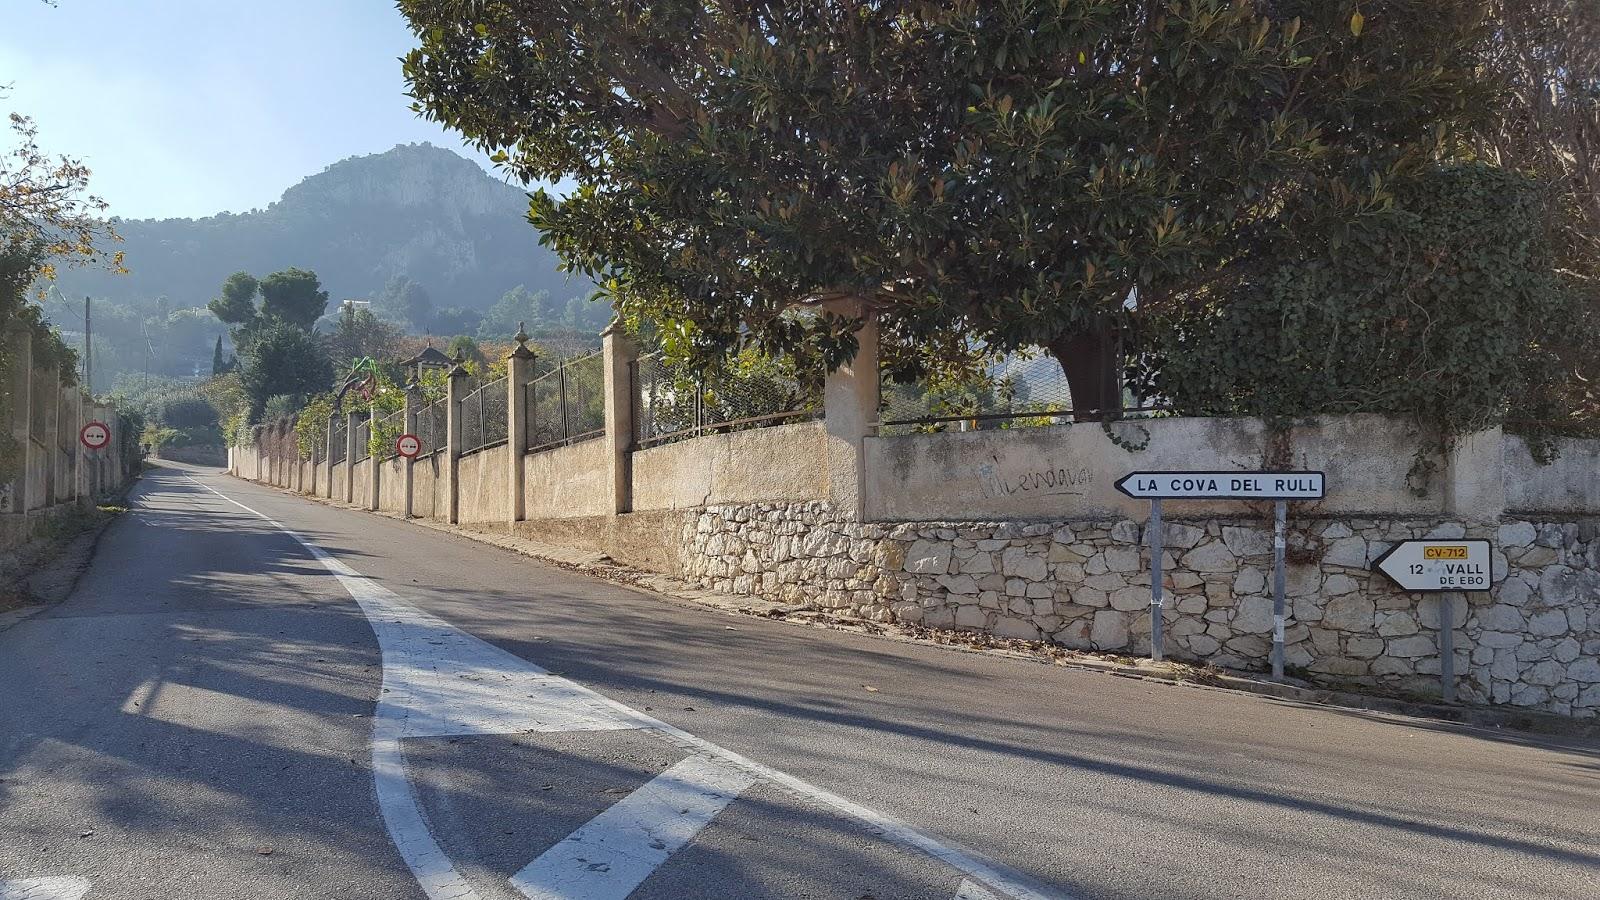 Junction of CV-712 and CV-715, Pego, Alicante, Spain